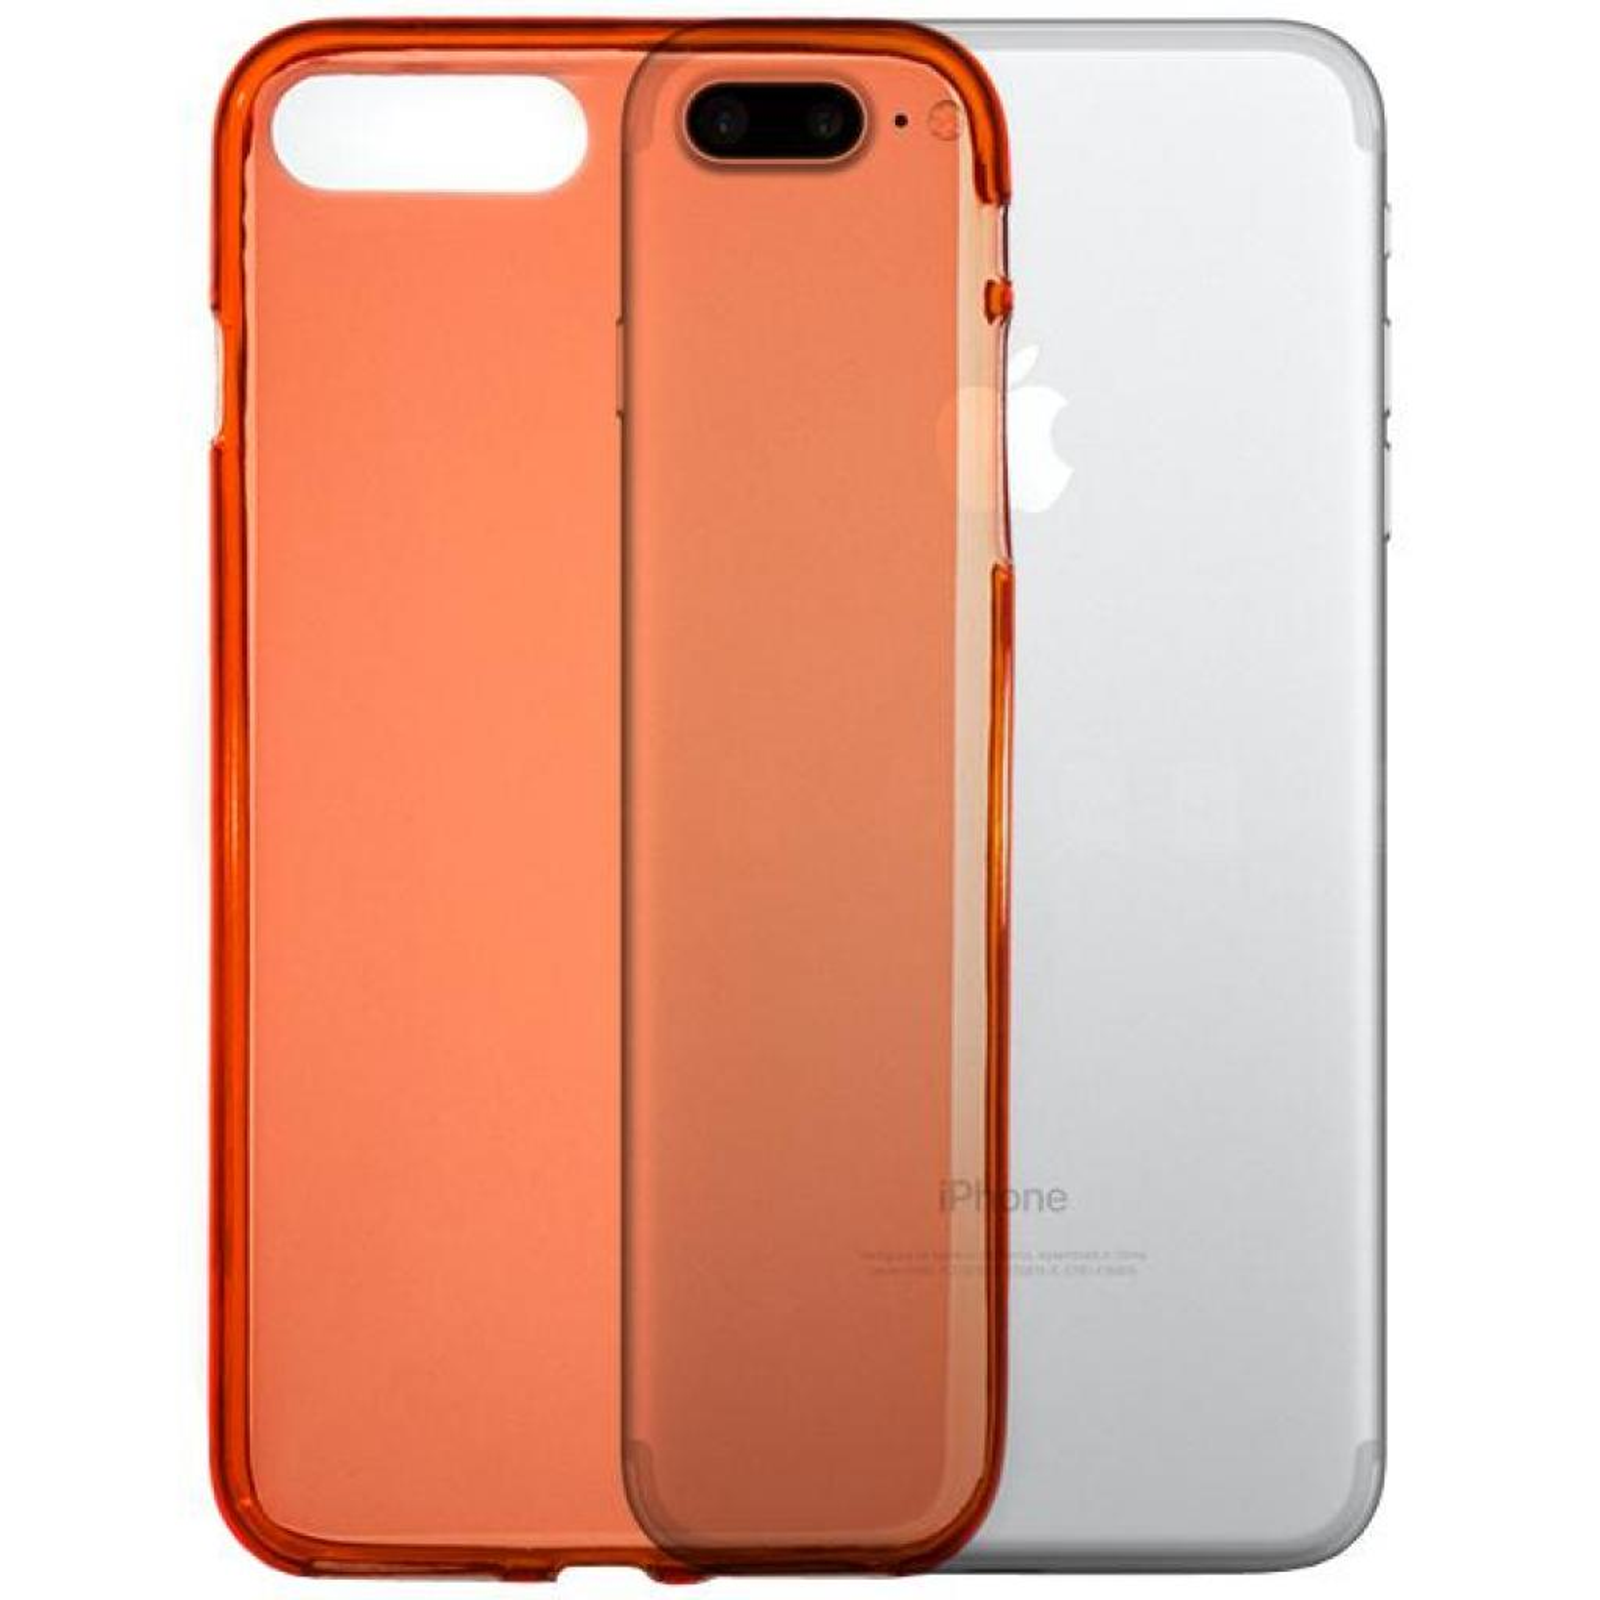 Чехол для моб. телефона Colorway TPU case for Apple iPhone 7/8 plus, red (CW-CTPAI7P-RD) изображение 2